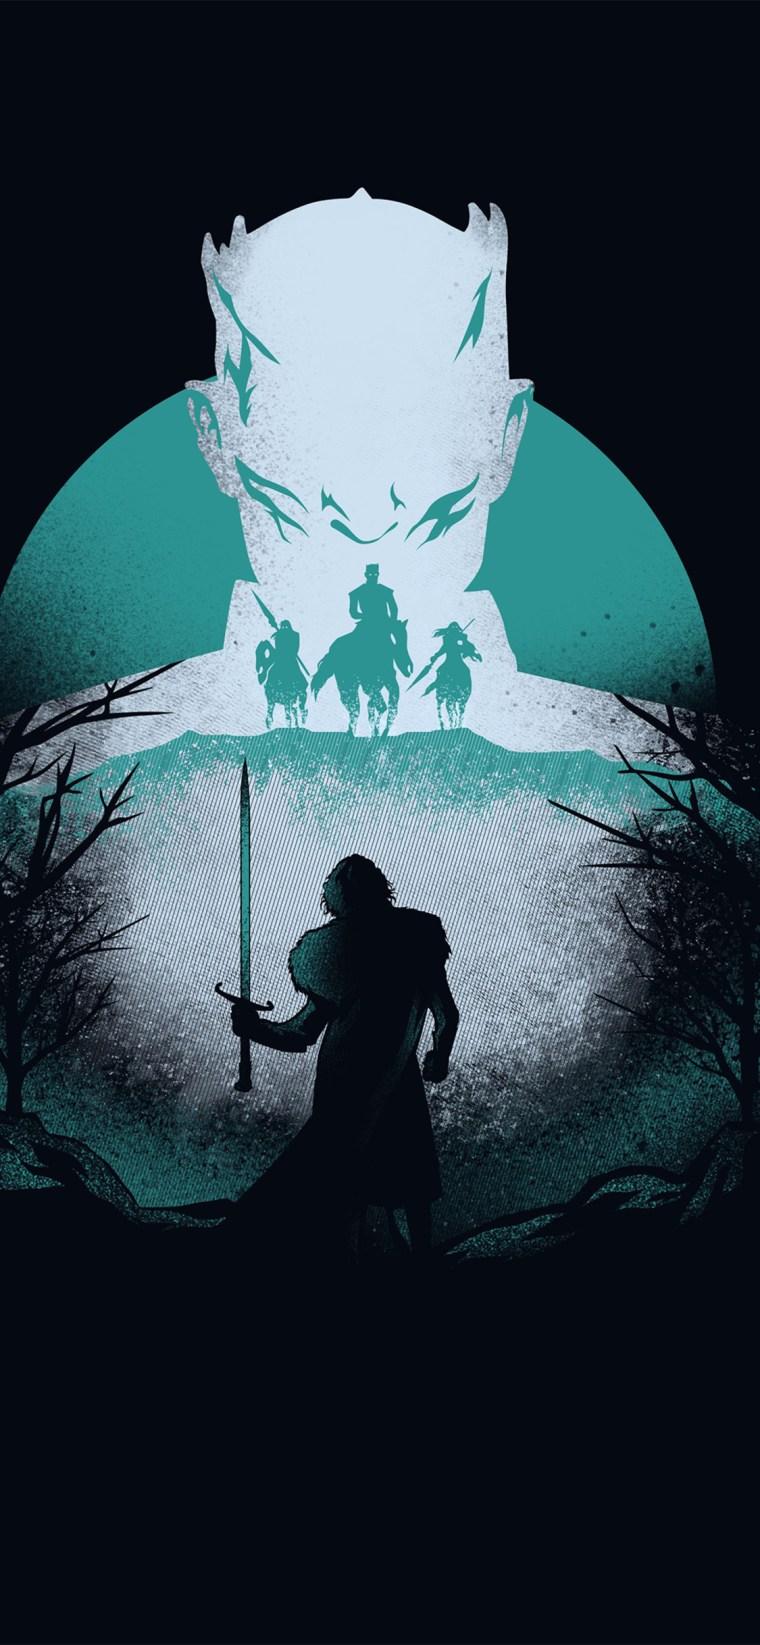 game-of-thrones-season-8-artwork iPhone game of thrones wallpaper